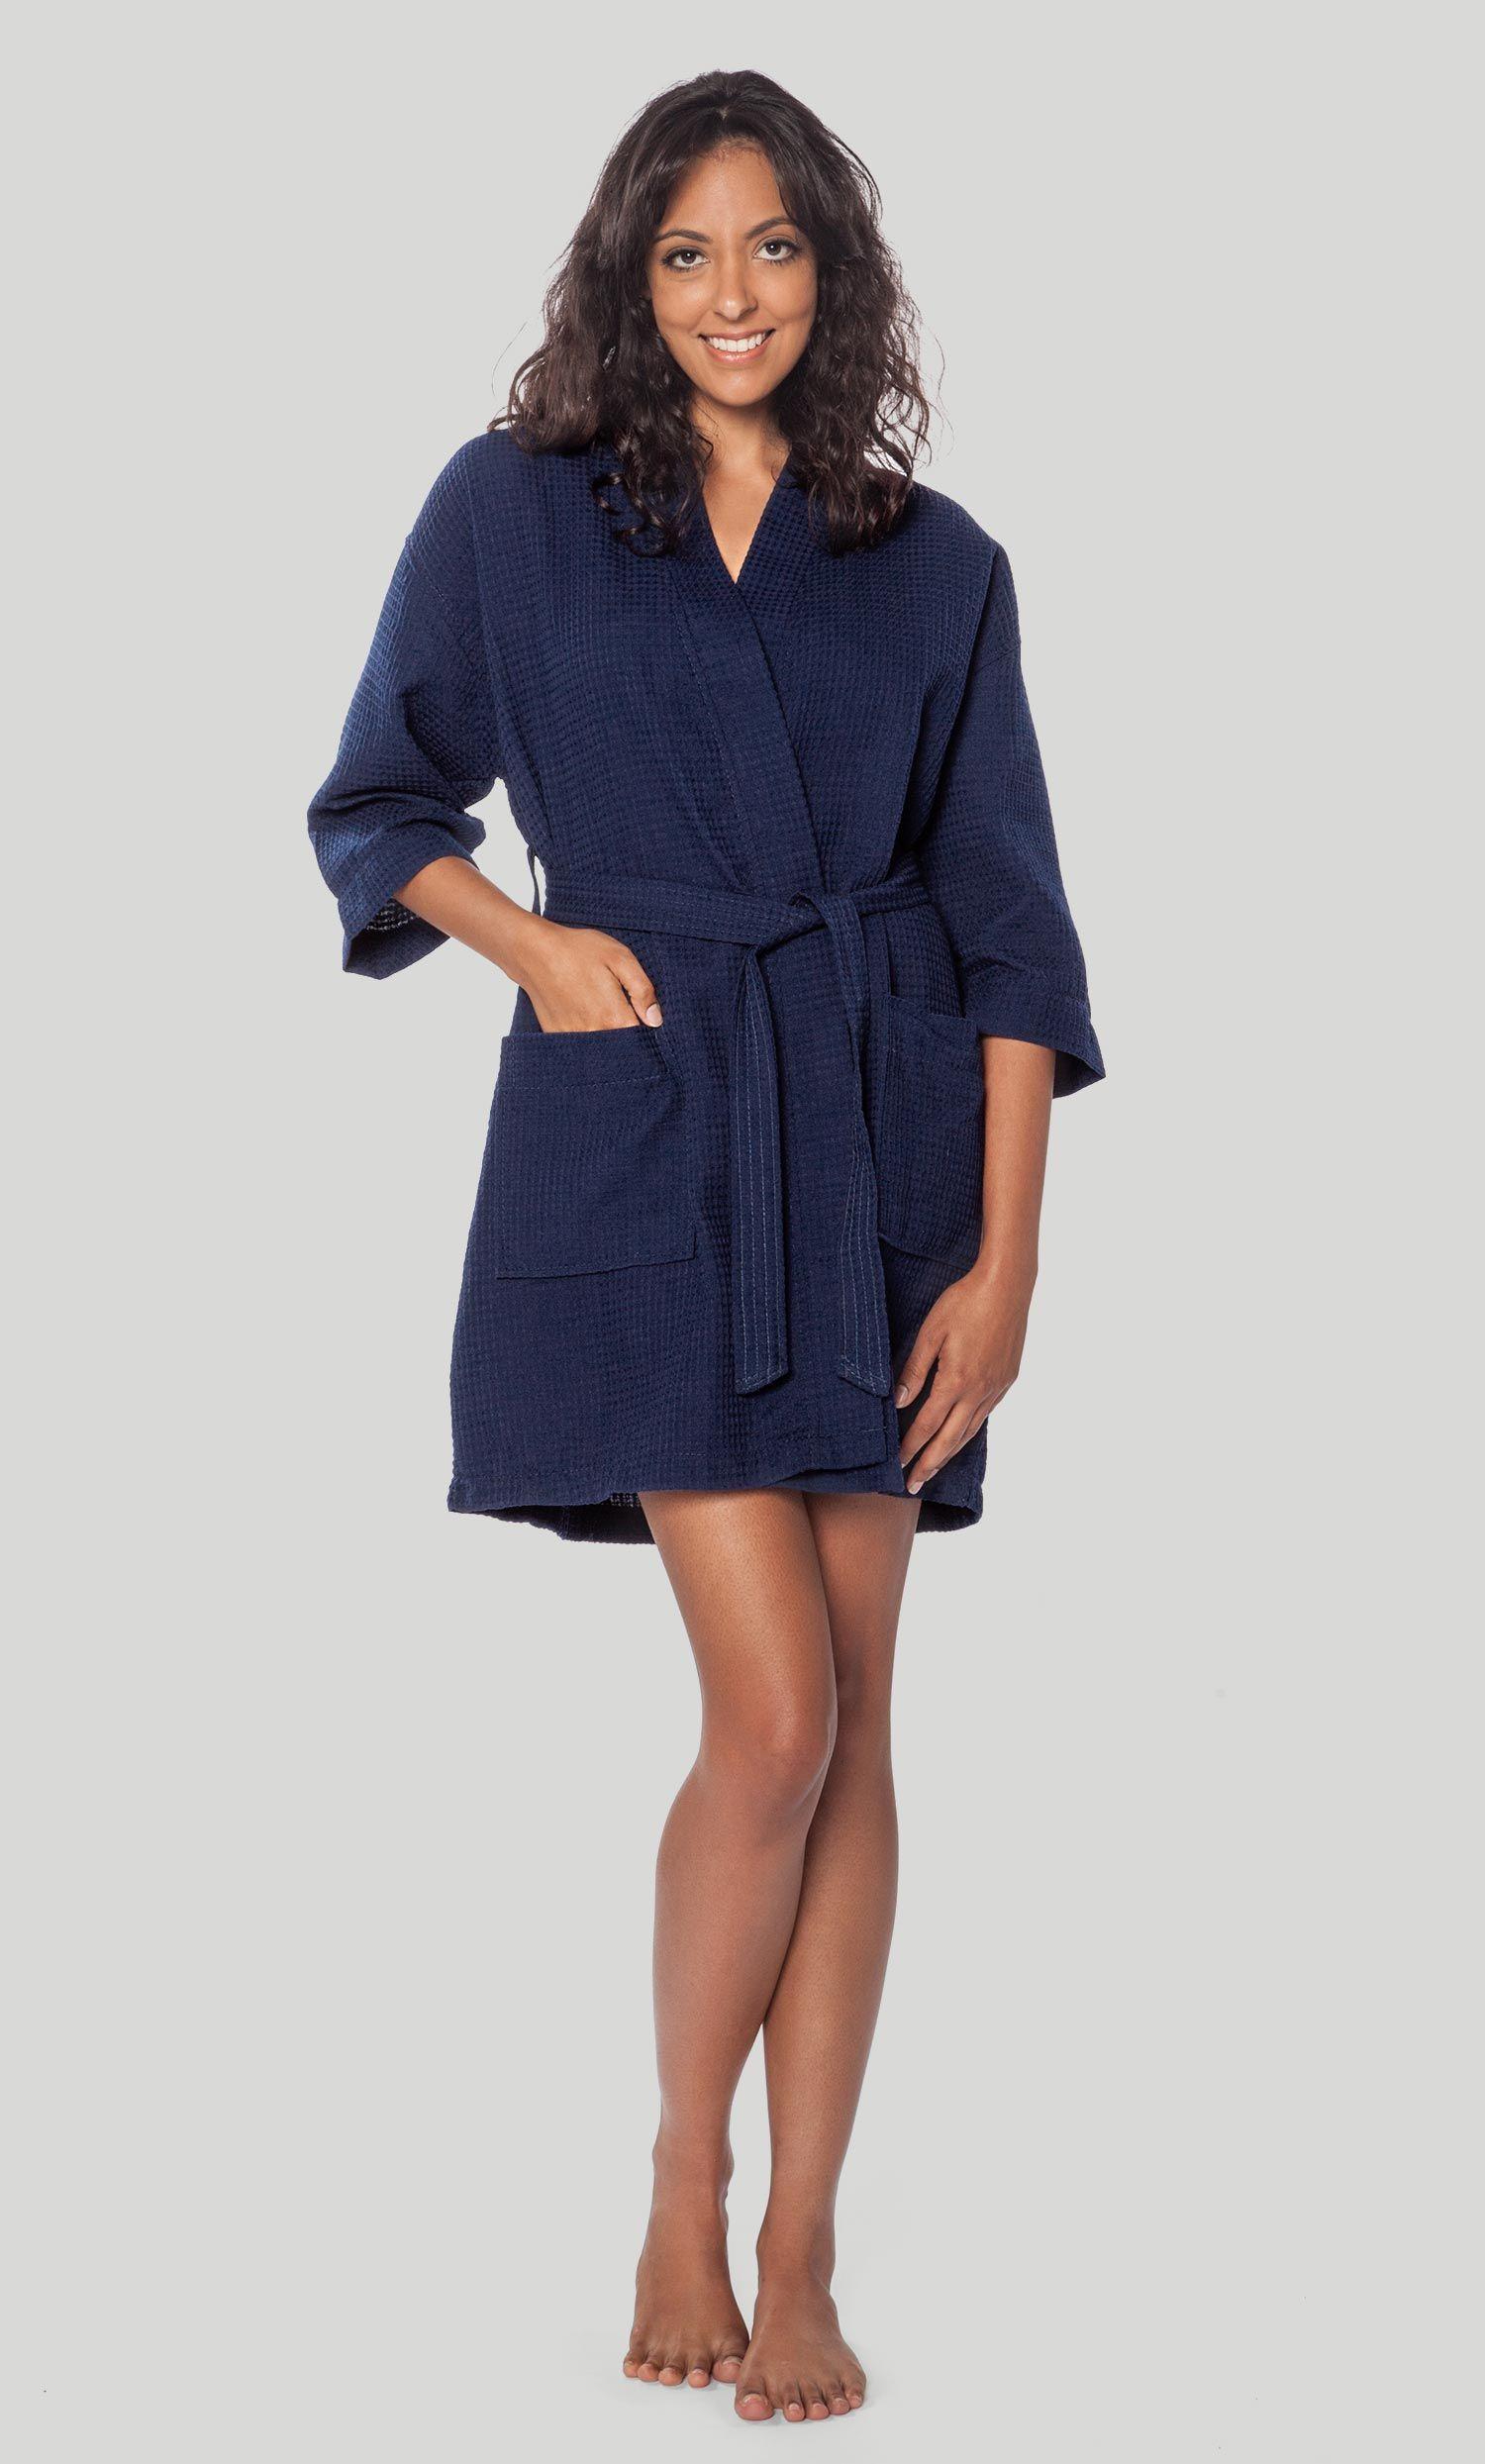 5207c57687 All Bathrobes    Waffle Kimono Navy Blue Short Robe Square Pattern -  Wholesale bathrobes